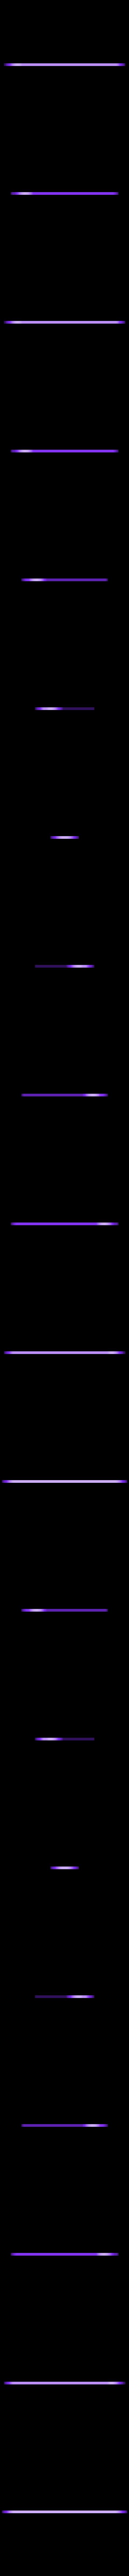 Screen_menu_plate.stl Download free STL file Portable Raspberry Pi game console • 3D printing object, Lassaalk